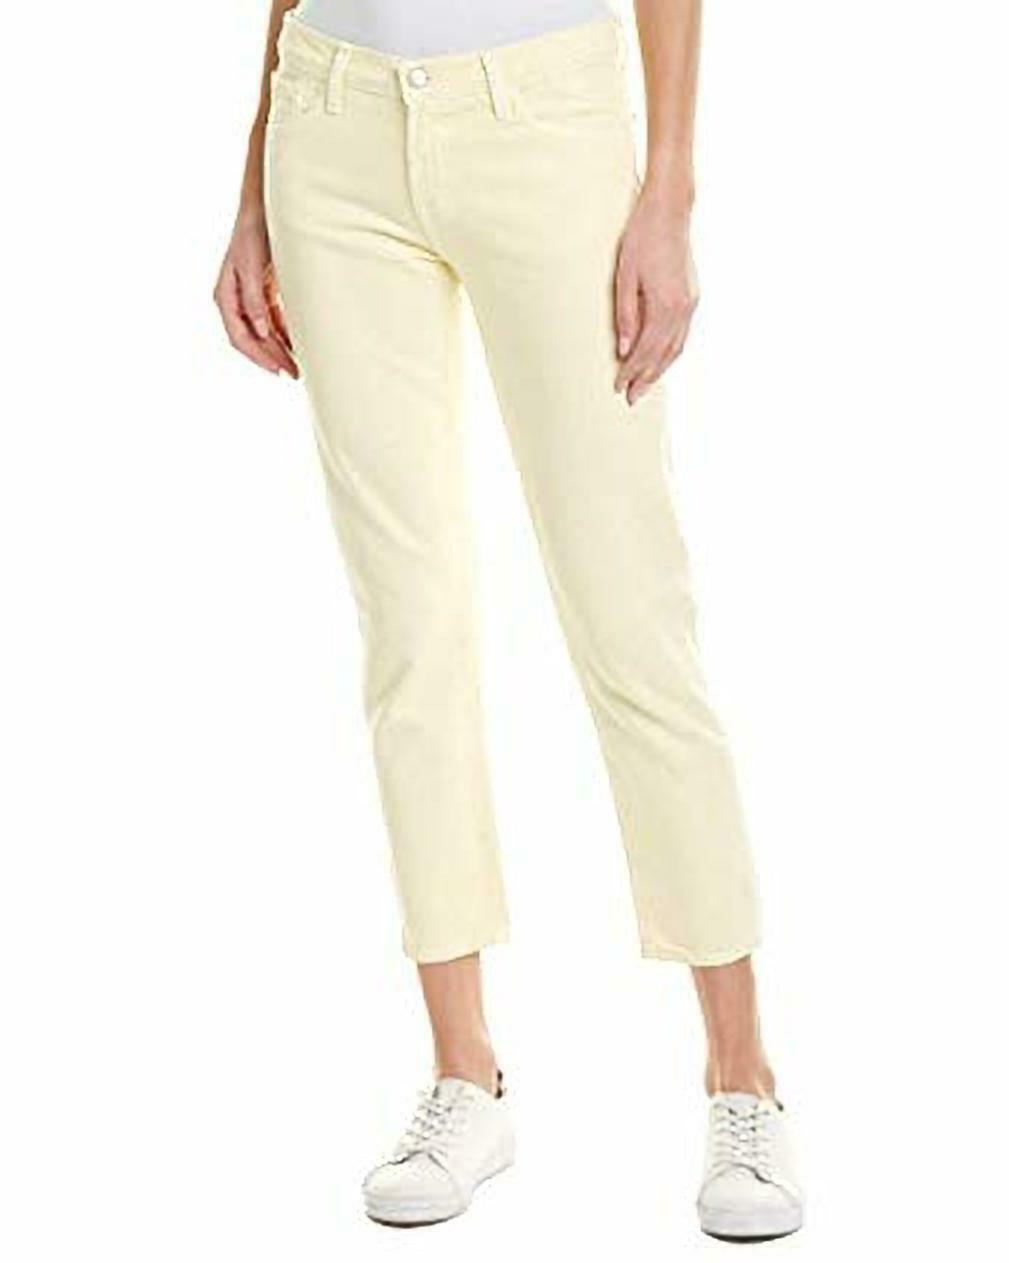 J Brand Sadey Butter Slim Straight Leg Size 24 MSRP: $198.00 image 2